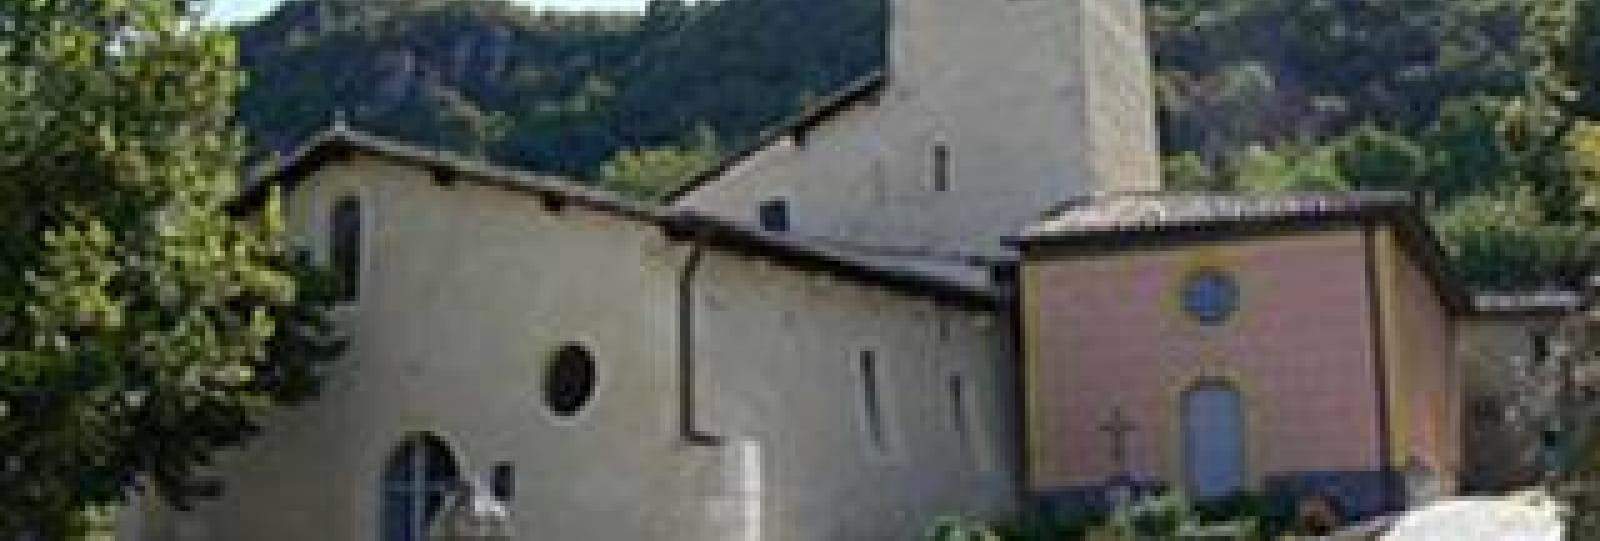 Eglise de Saint-Martin-d'Hostun